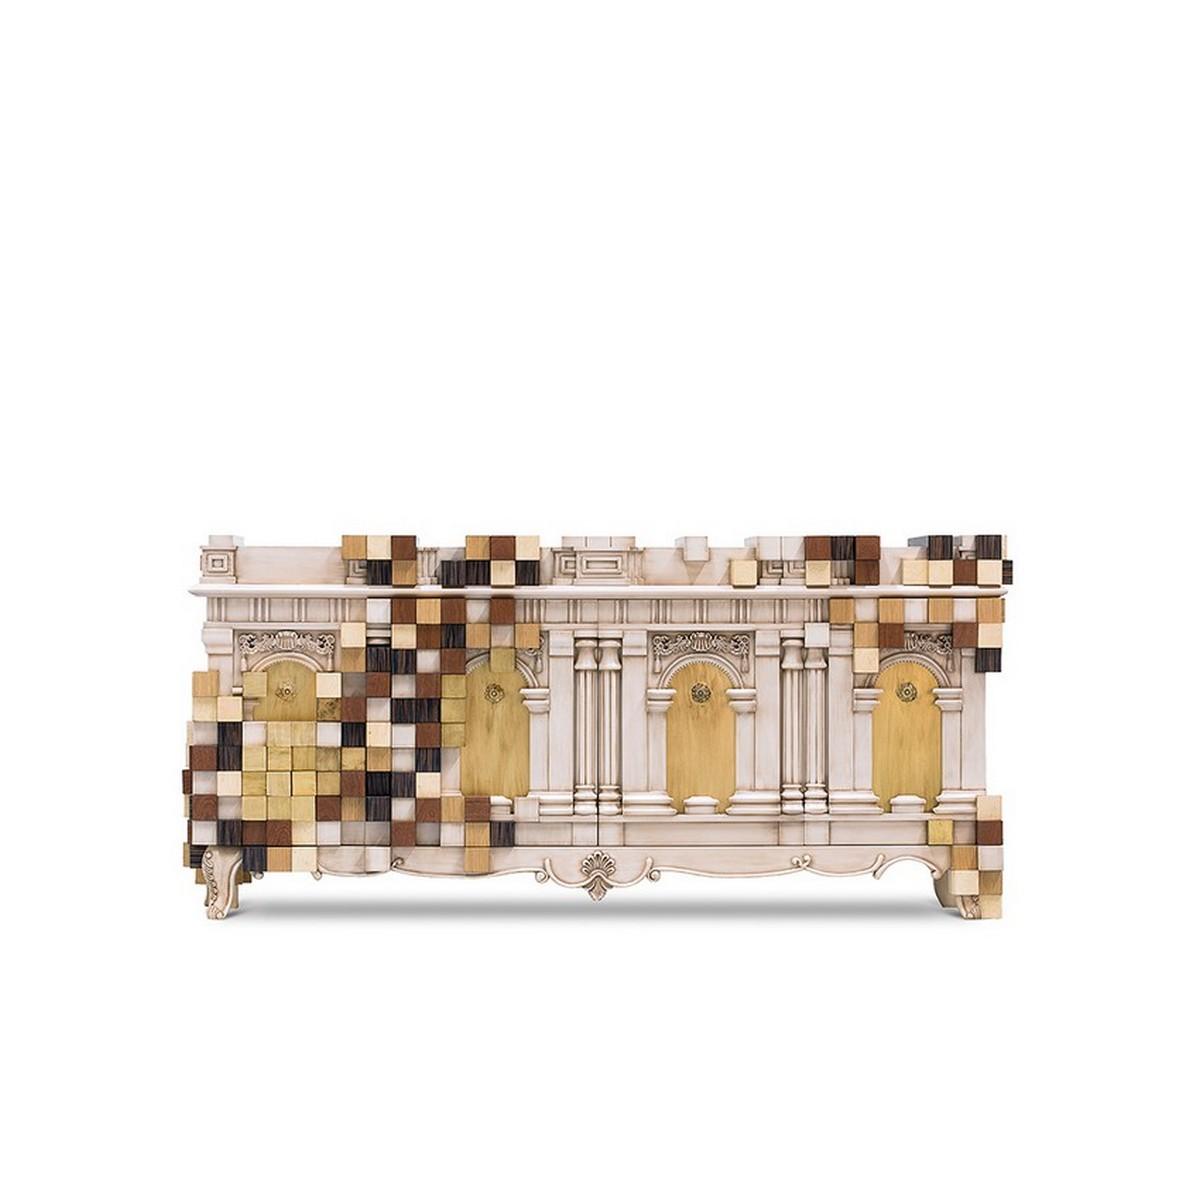 Ideas para Interiores: Belleza para un proyecto lujuoso con Texturas ideas para interiores Ideas para Interiores: Belleza para un proyecto lujuoso con Texturas bl piccadilly sideboard general img 1200x1200